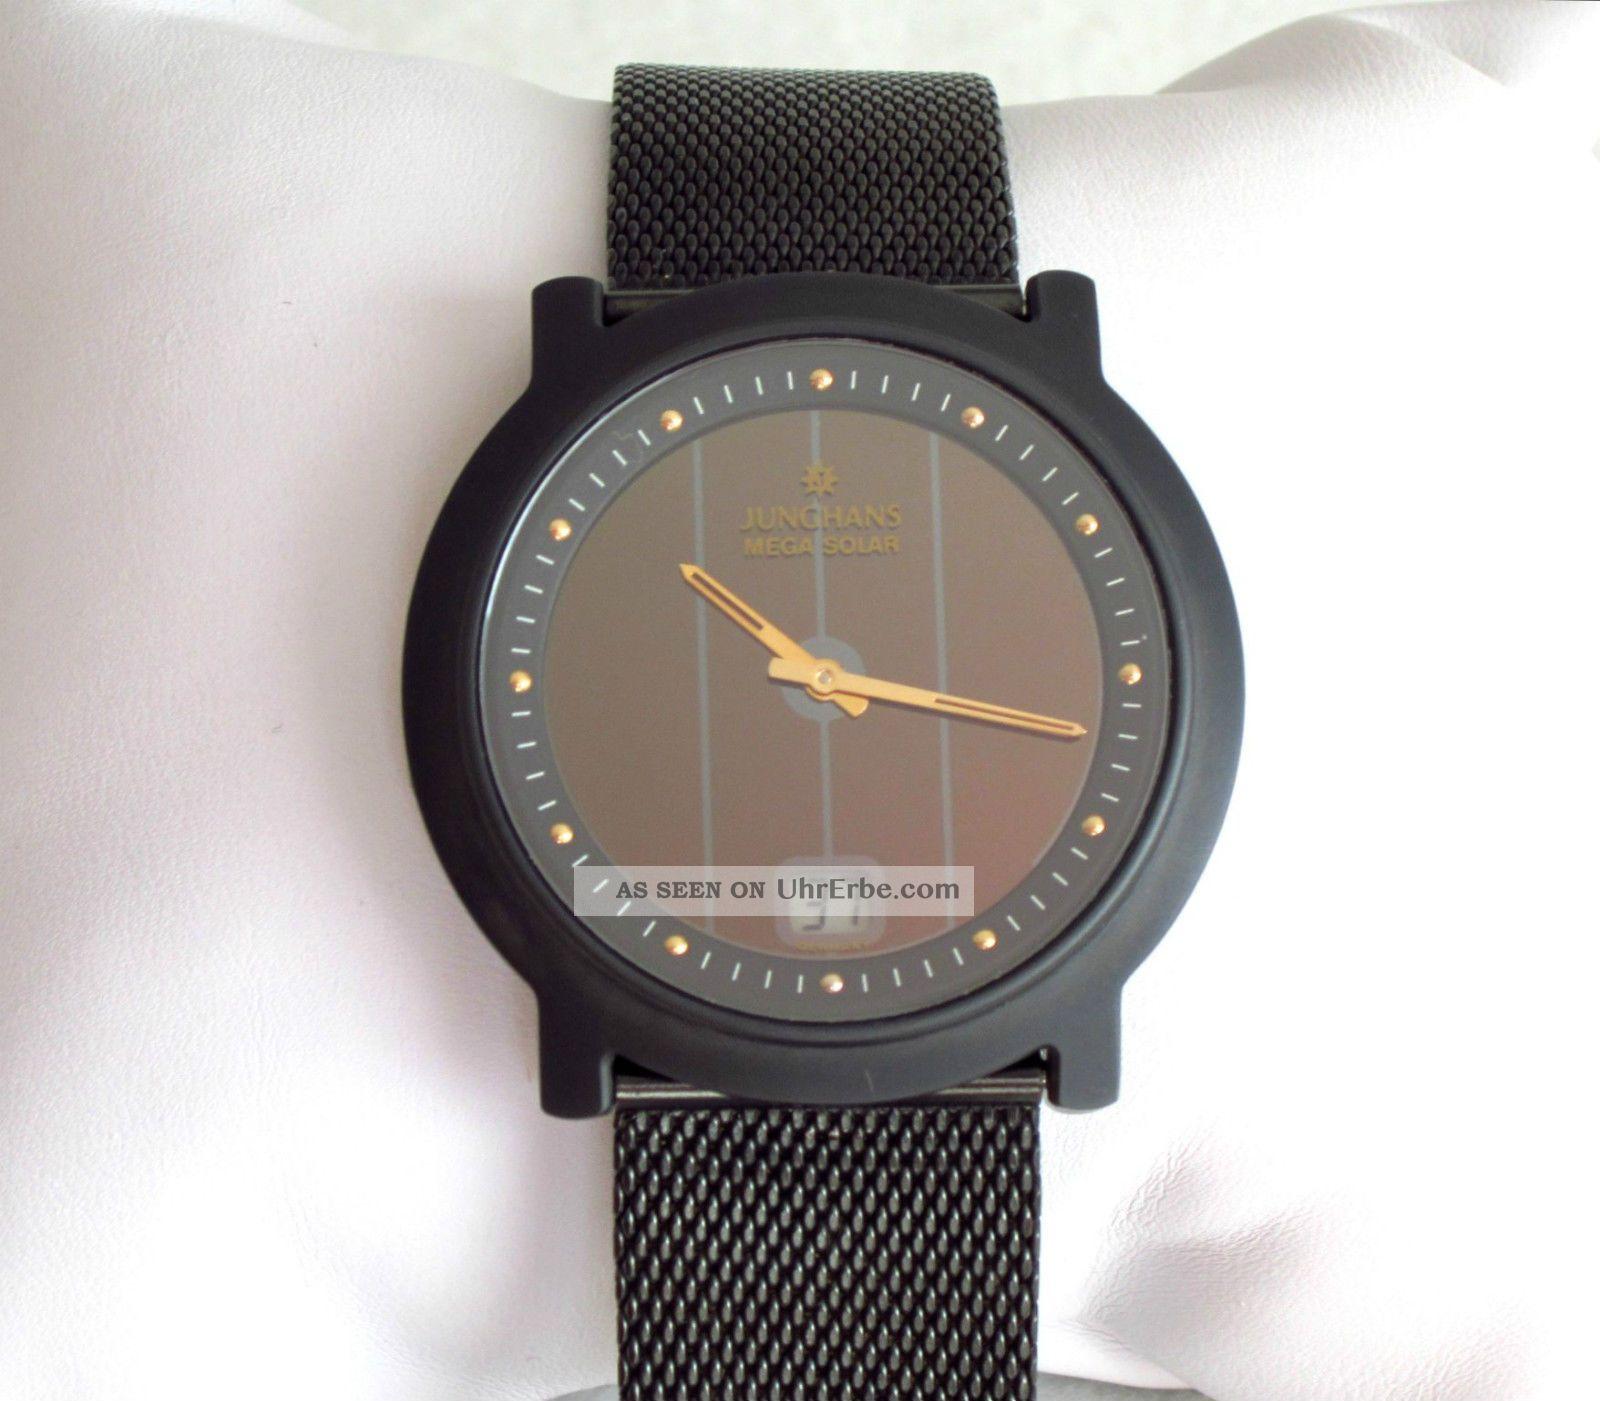 Junghans Mega Solar Ceramic Funkuhr Mit Milanaiseband Armbanduhren Bild